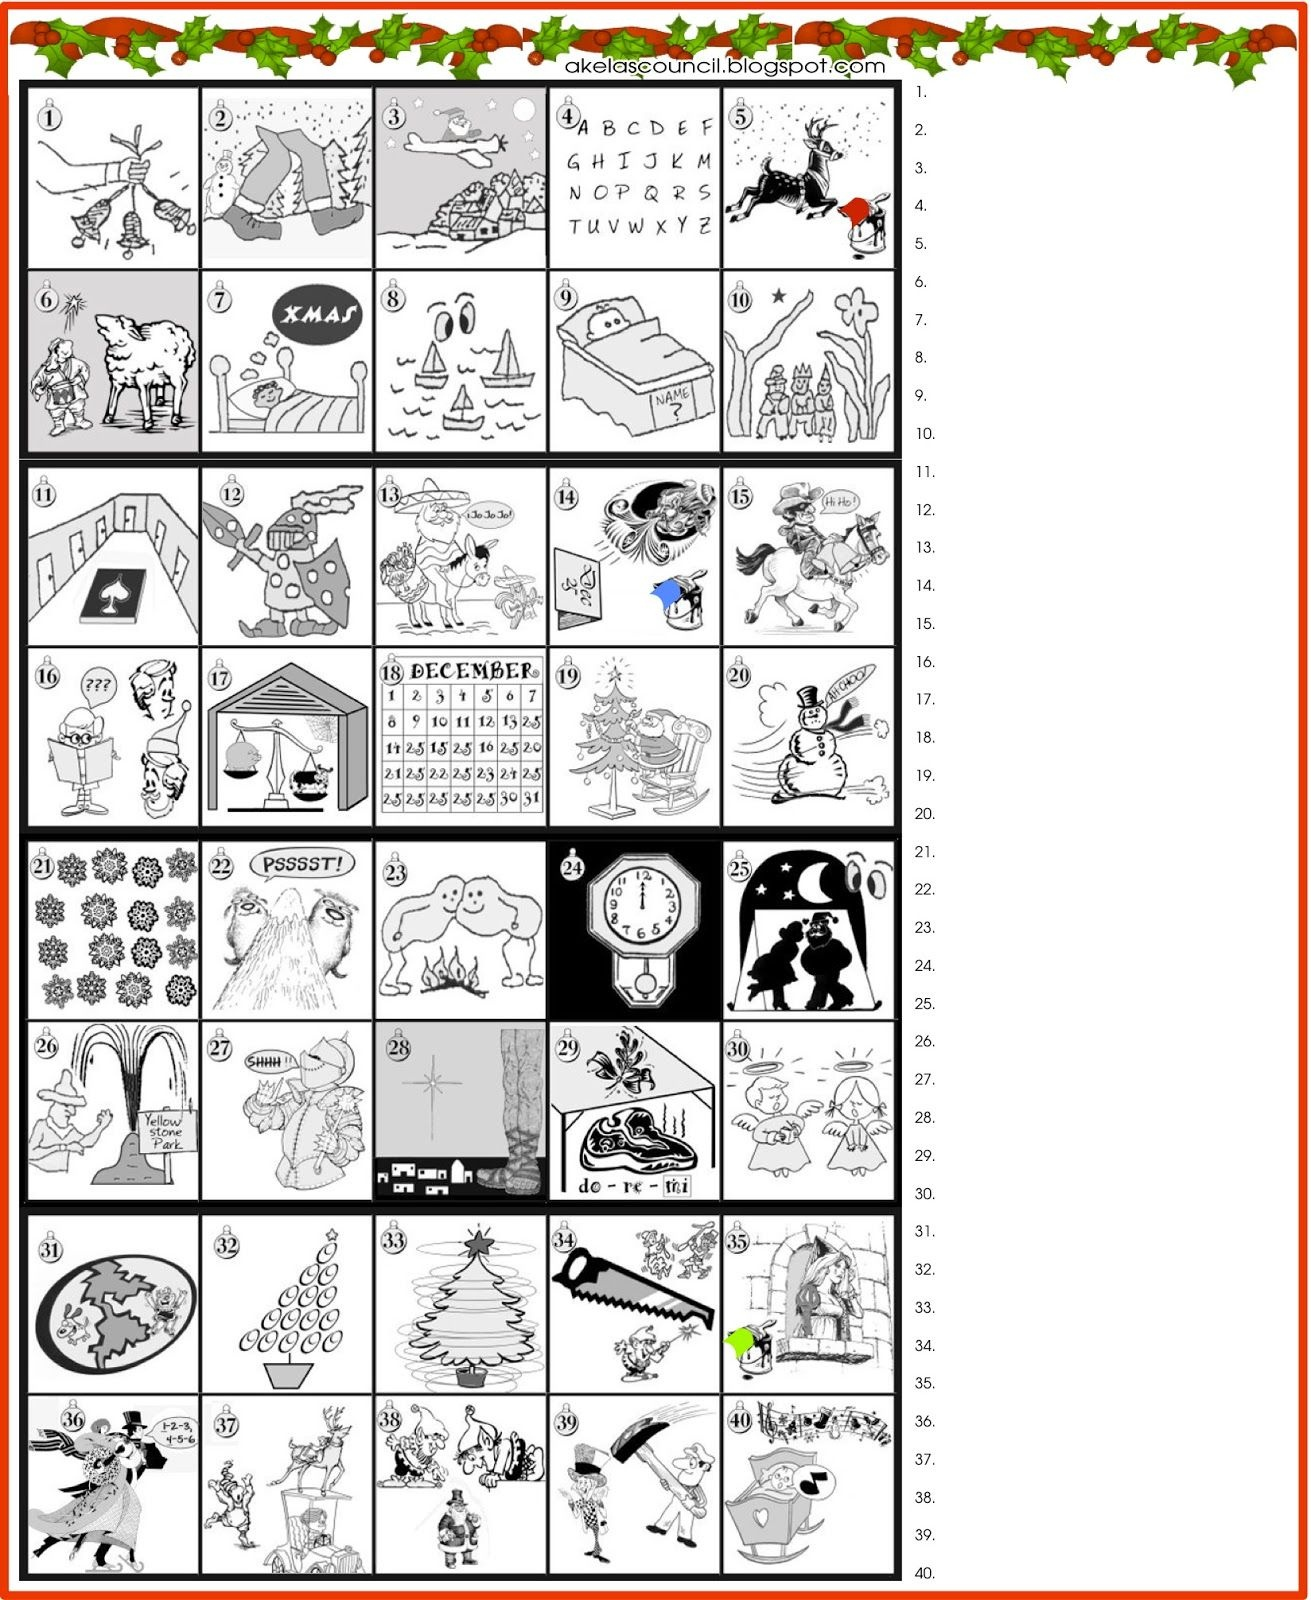 Printable * Guess The Christmas Songs Or Carols Word Puzzle - Free Printable Christmas Picture Puzzles